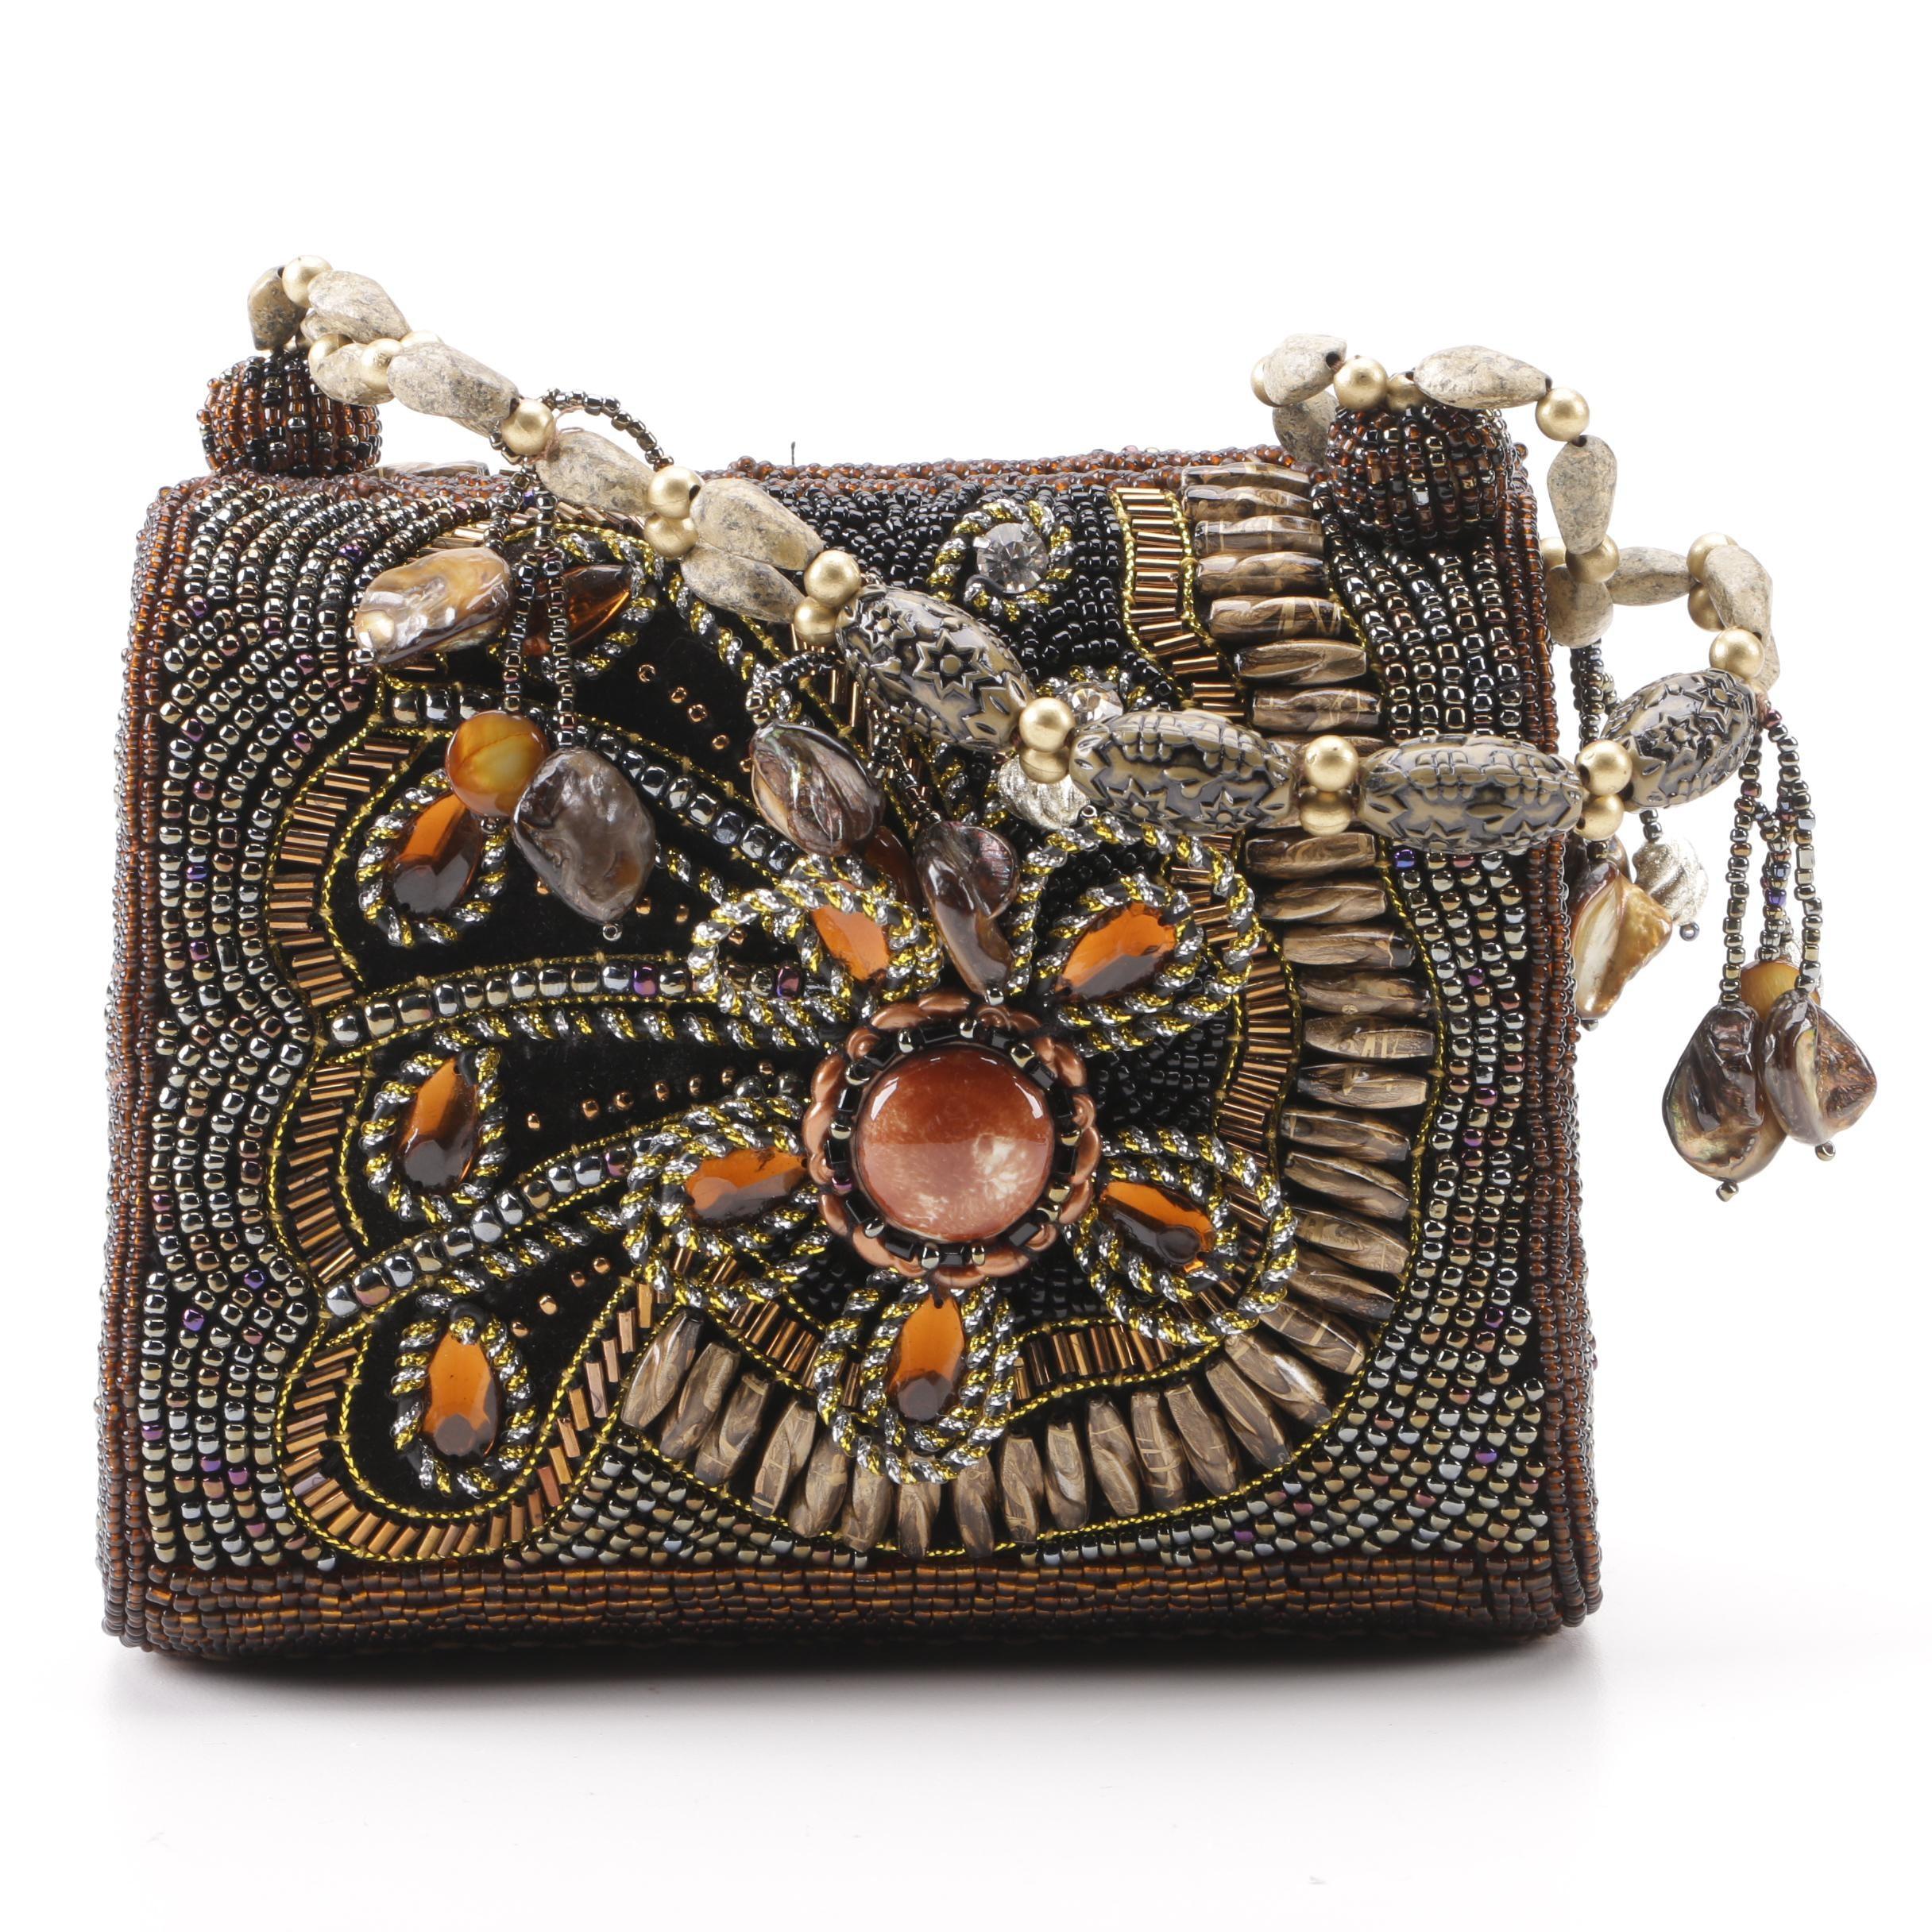 Contemporary Floral Motif Beaded Handbag